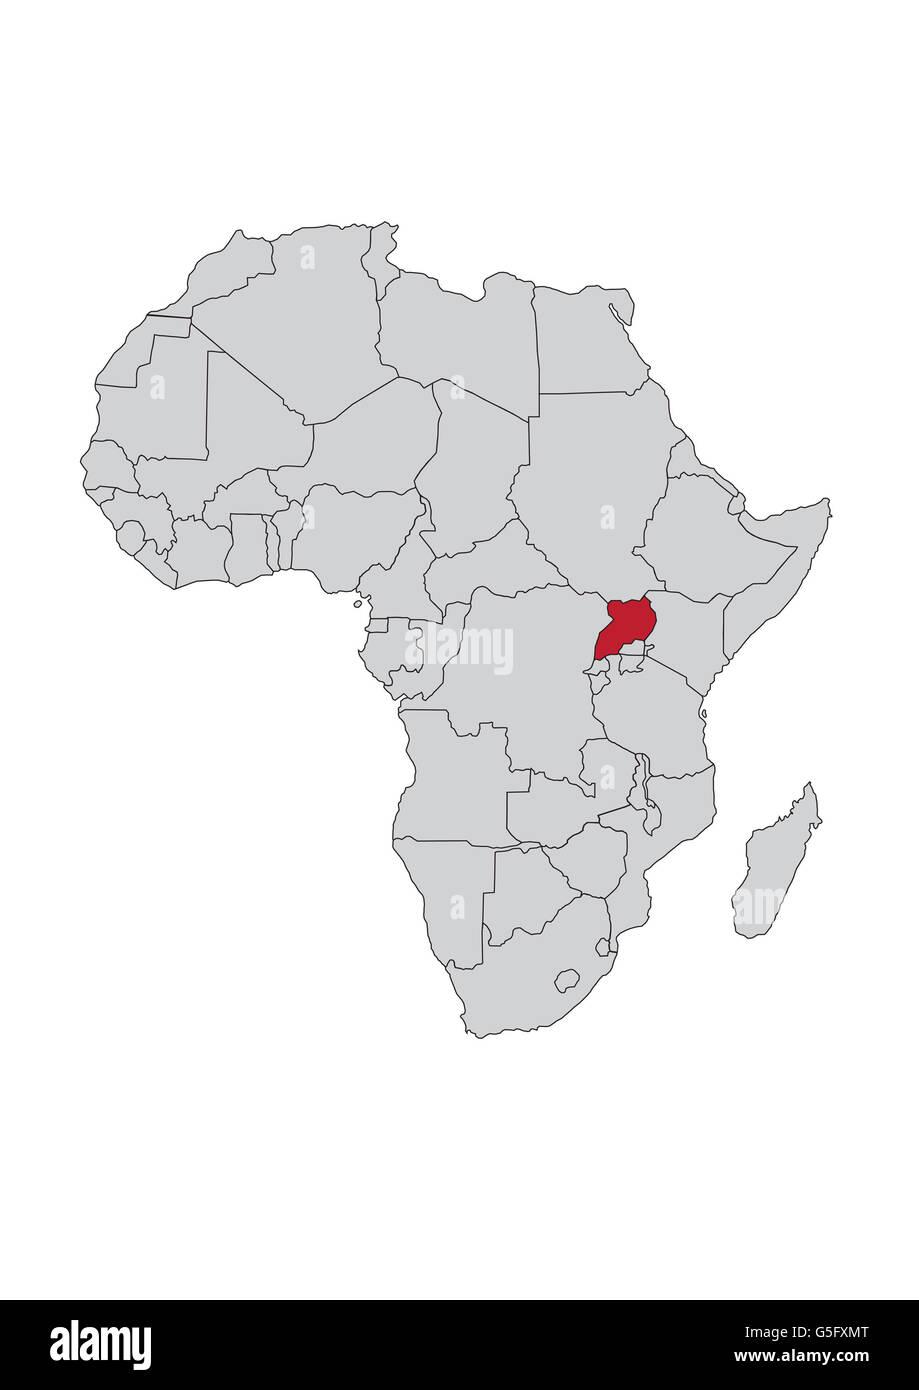 uganda map of africa Map Of Africa Uganda Stock Photo Alamy uganda map of africa